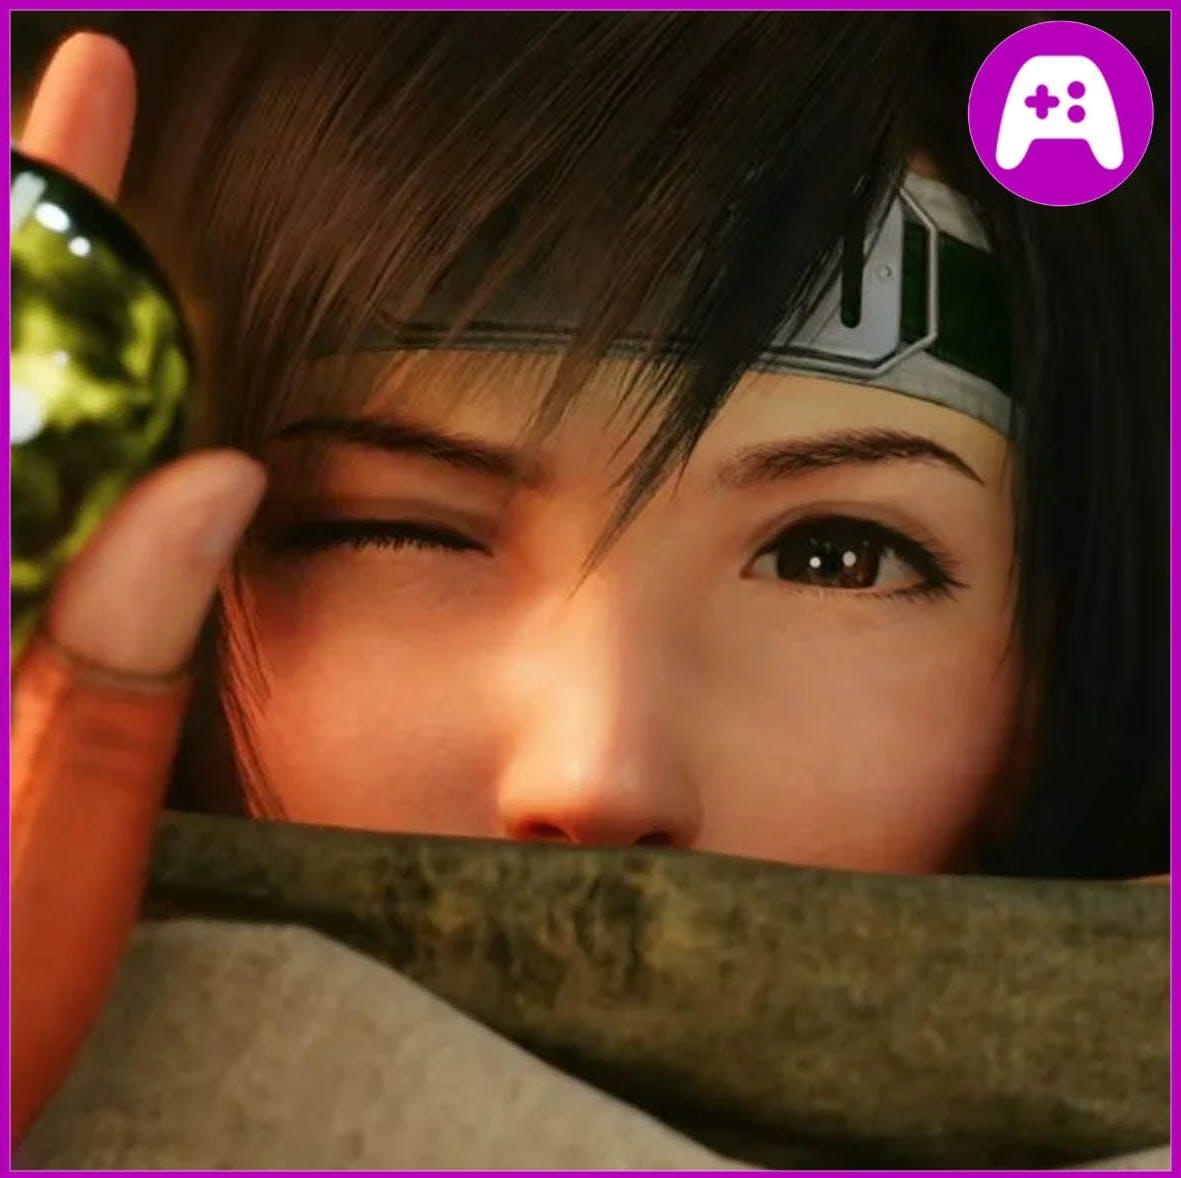 Final Fantasy VII Remake: Intergrade Announced - Ep. 223